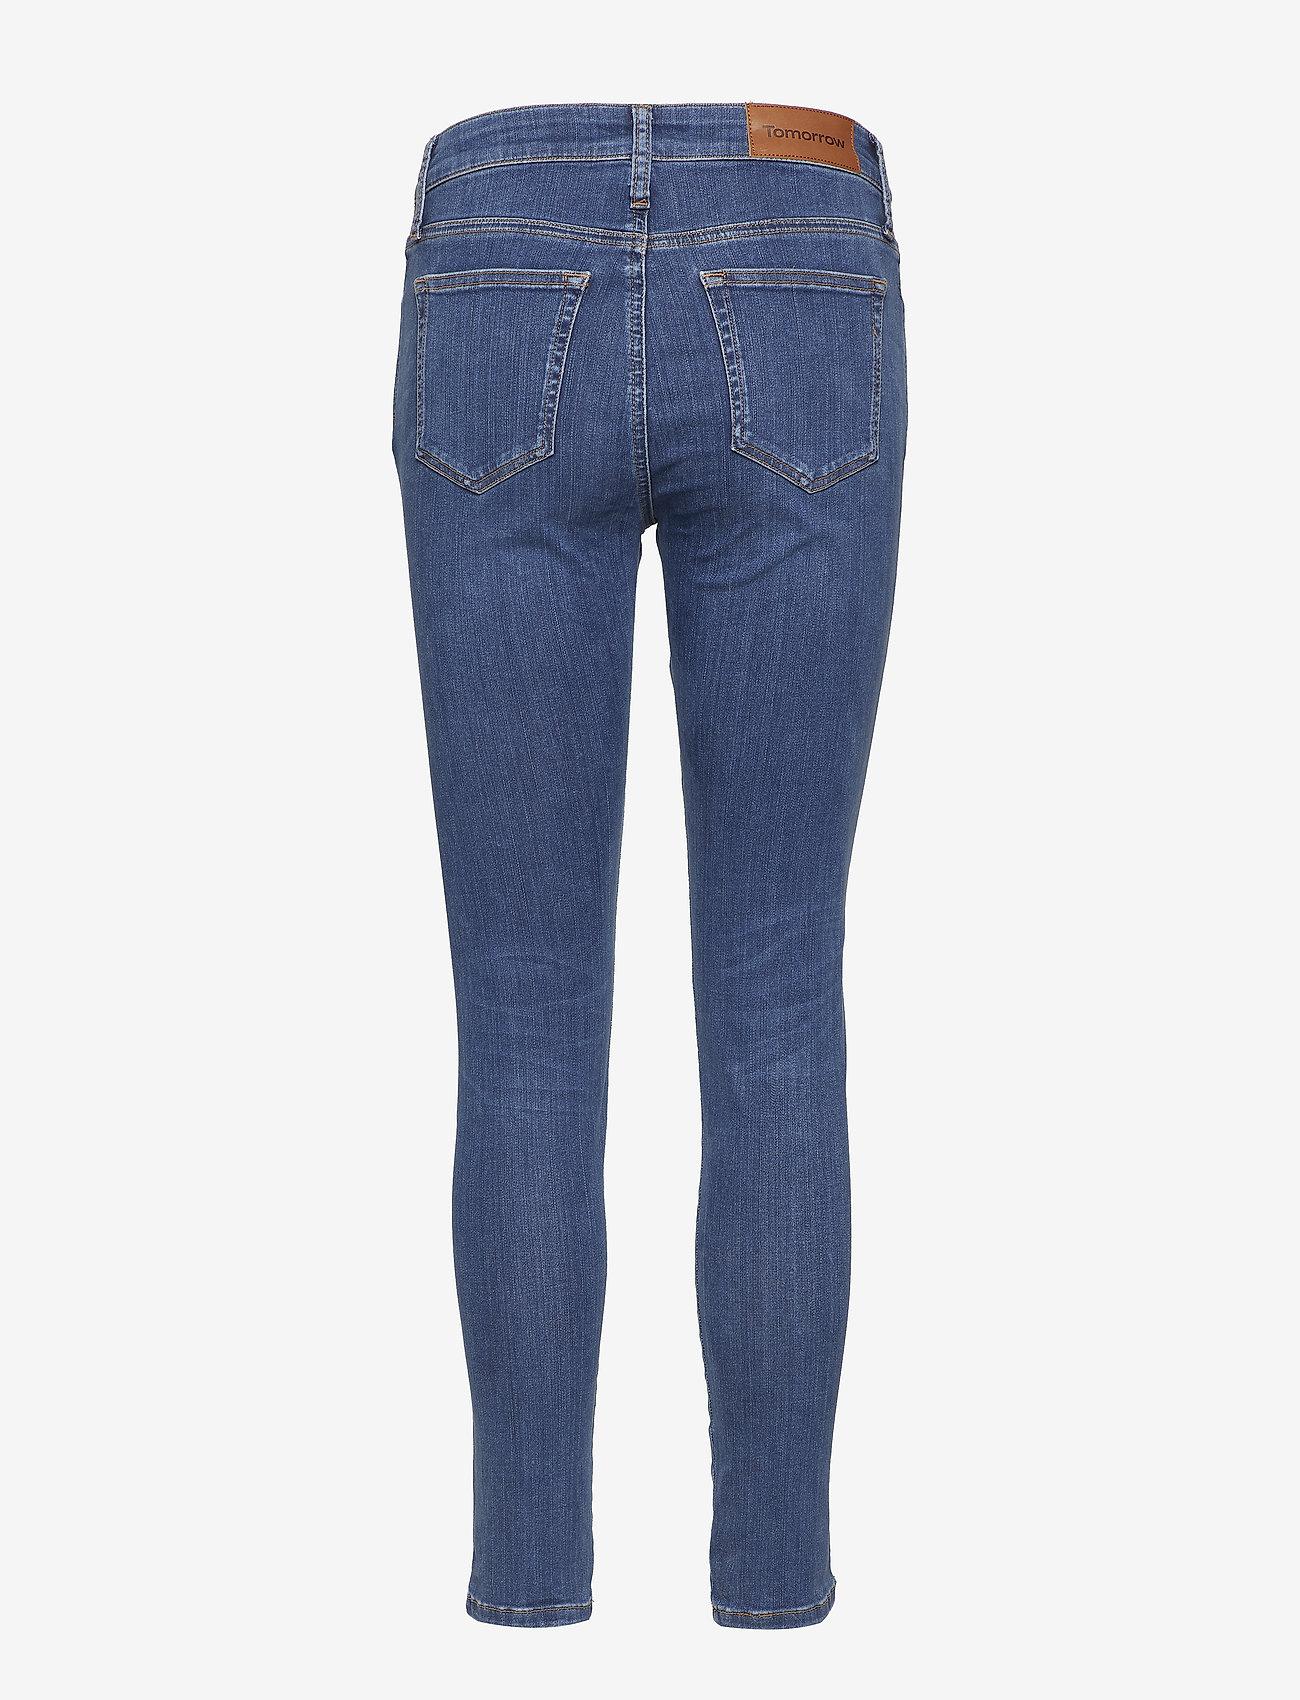 Tomorrow - Dylan MW cropped wash Texas - skinny jeans - 51 denim blue - 1